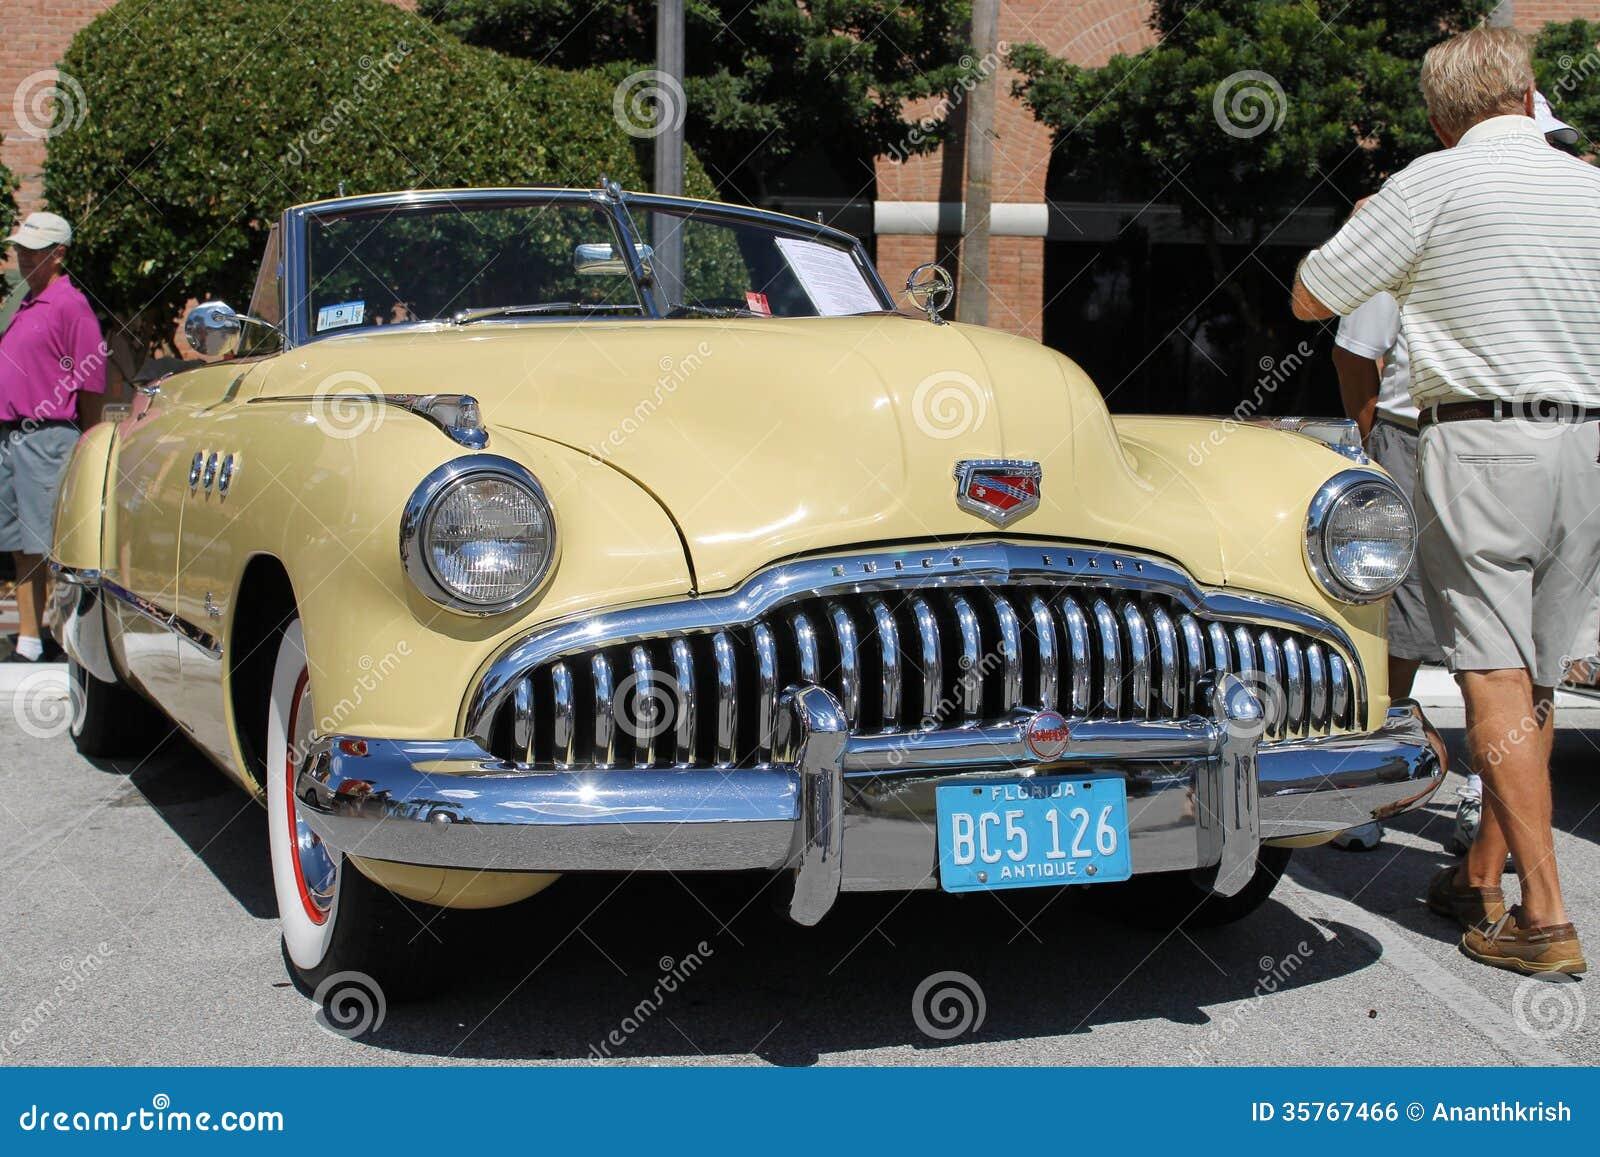 Old Buick Car At The Car Show Editorial Photo Image Of Road - Lakeland florida car show 2018